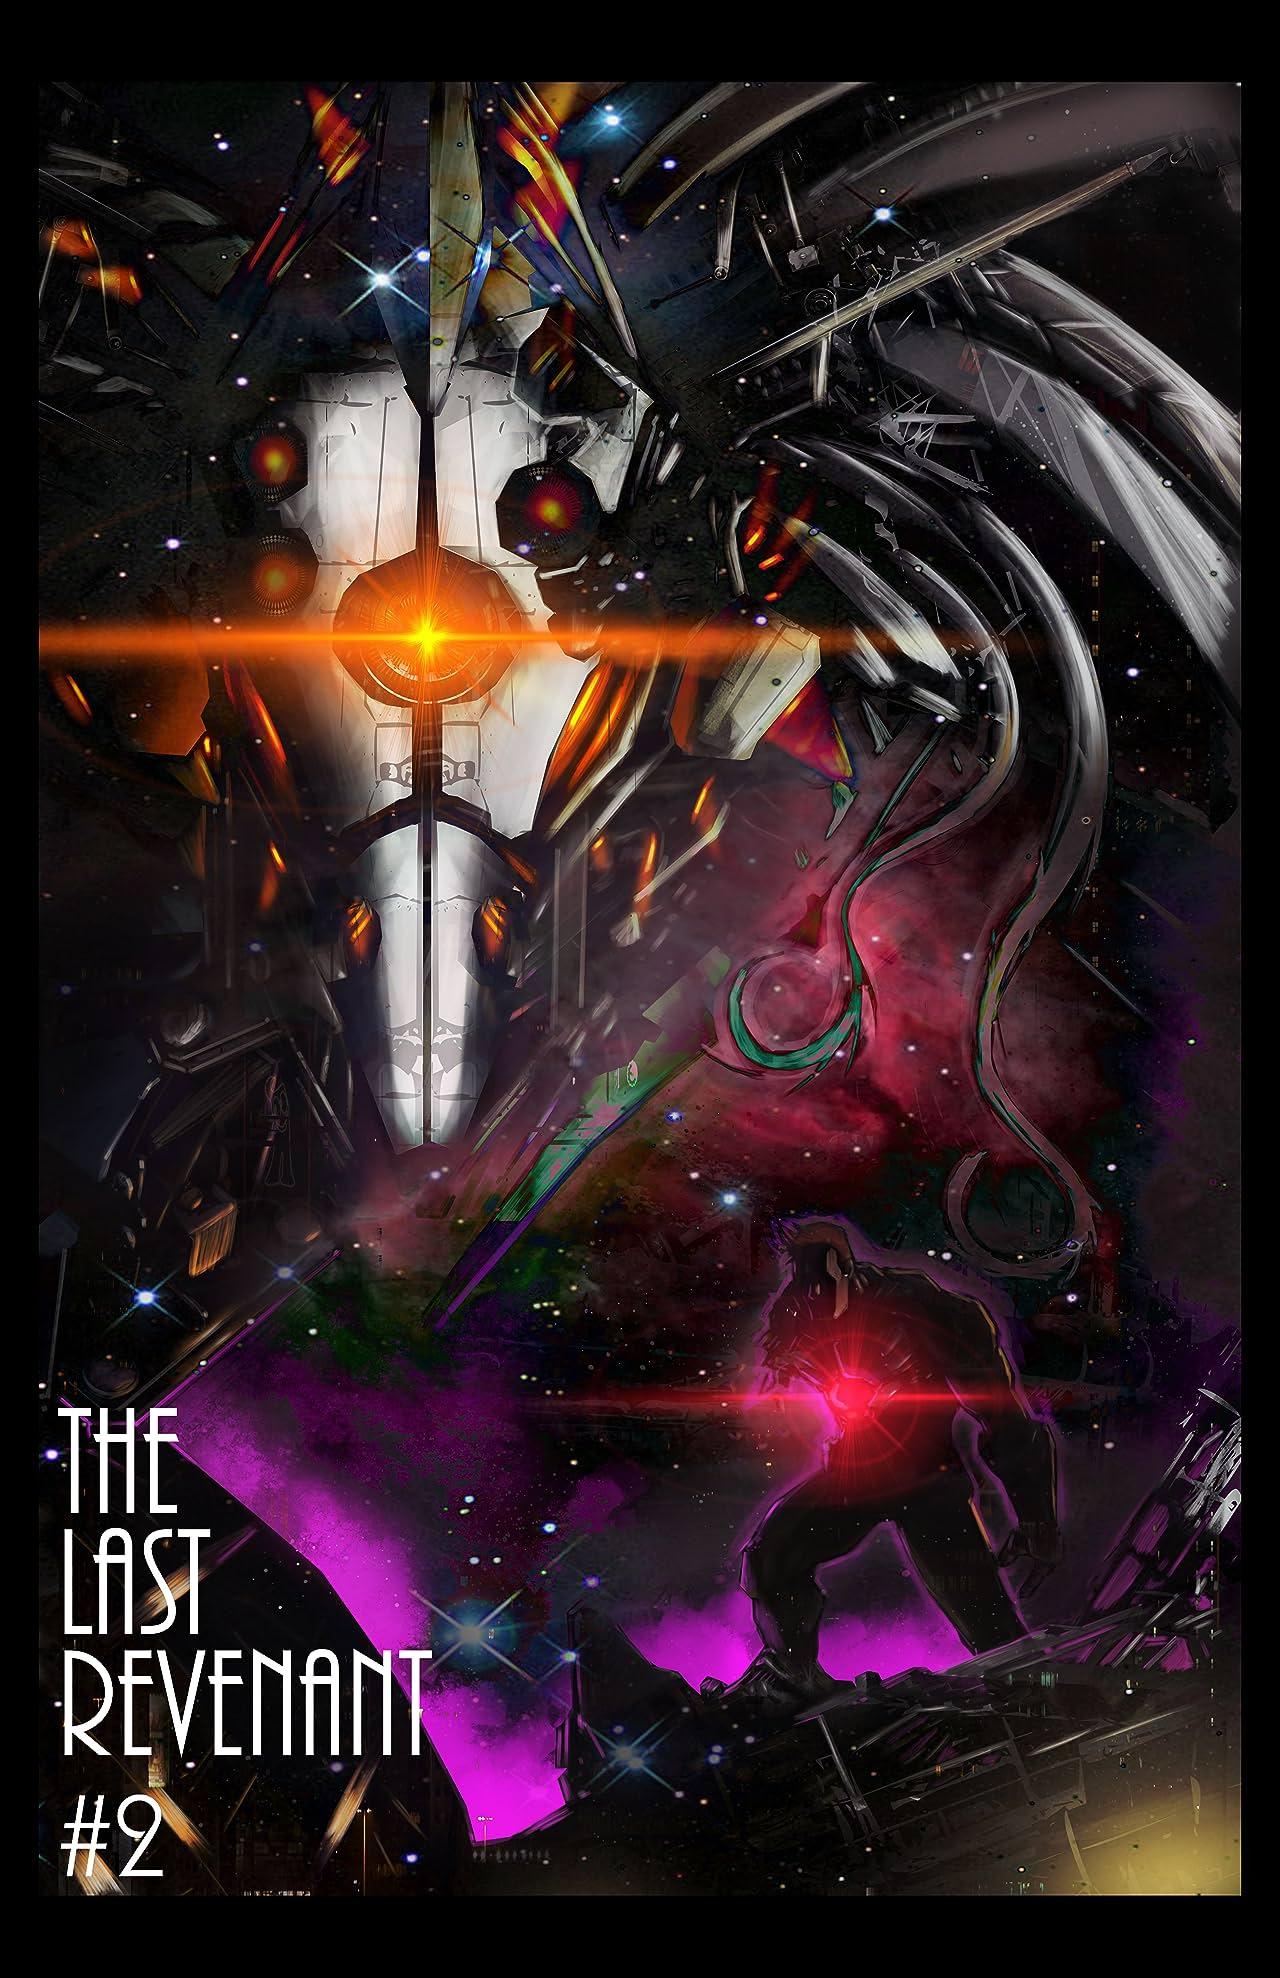 The Last Revenant #2